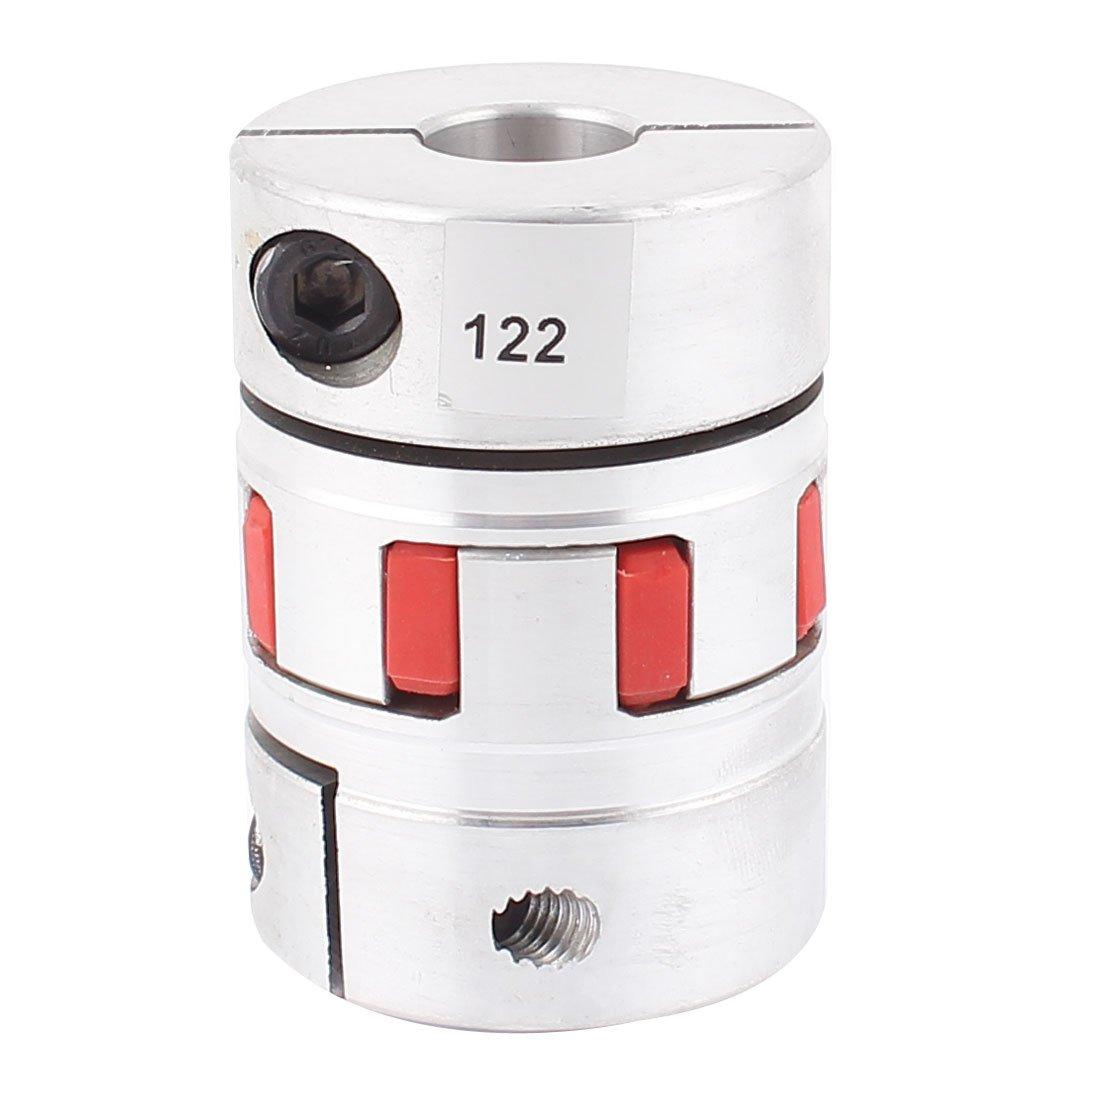 19mm x 19mm Flexible Stepper Motor Plum Coupling D55L78 Aluminum Alloy